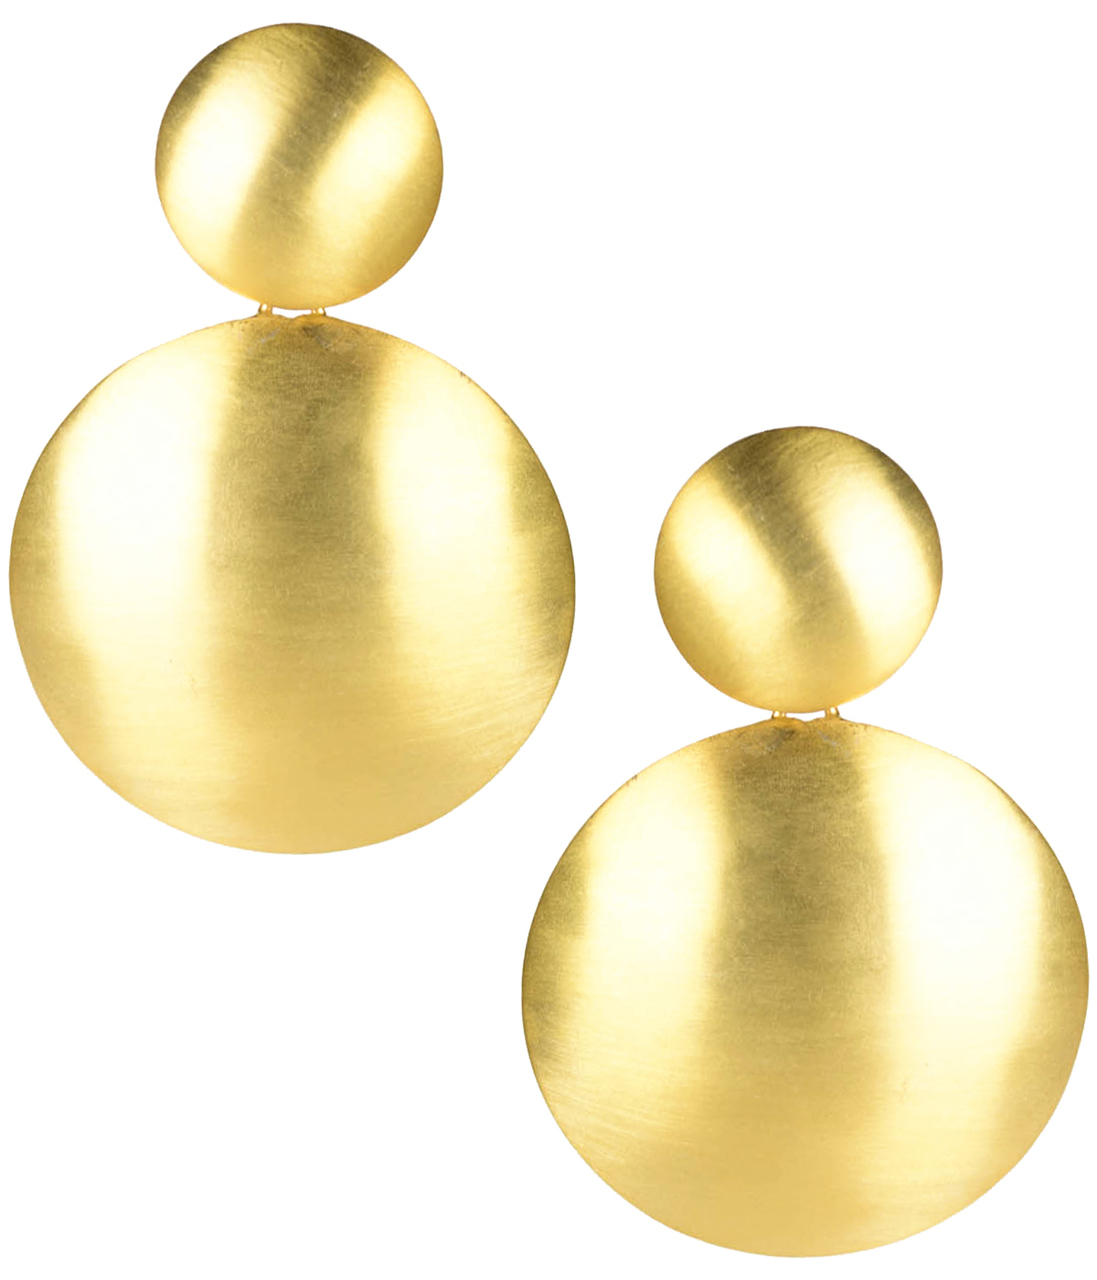 Robin Brushed Gold Earrings